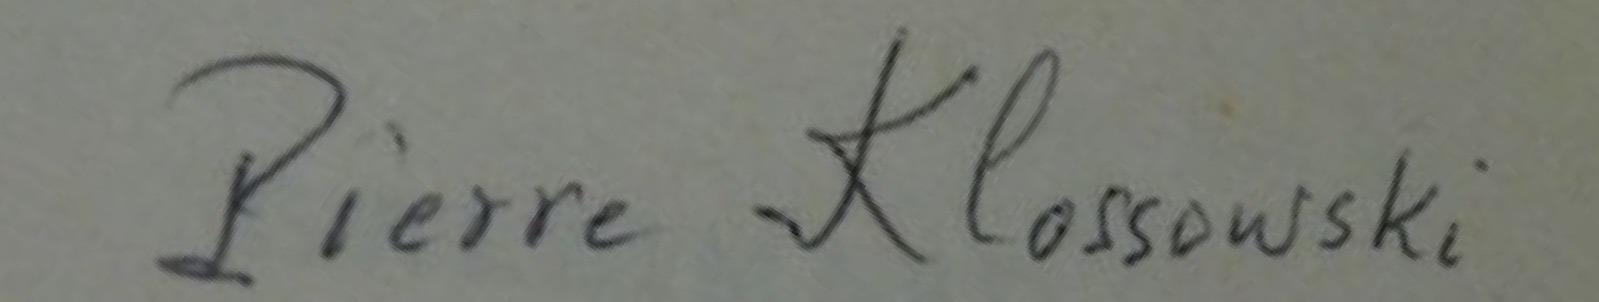 signature expertise Klossowski